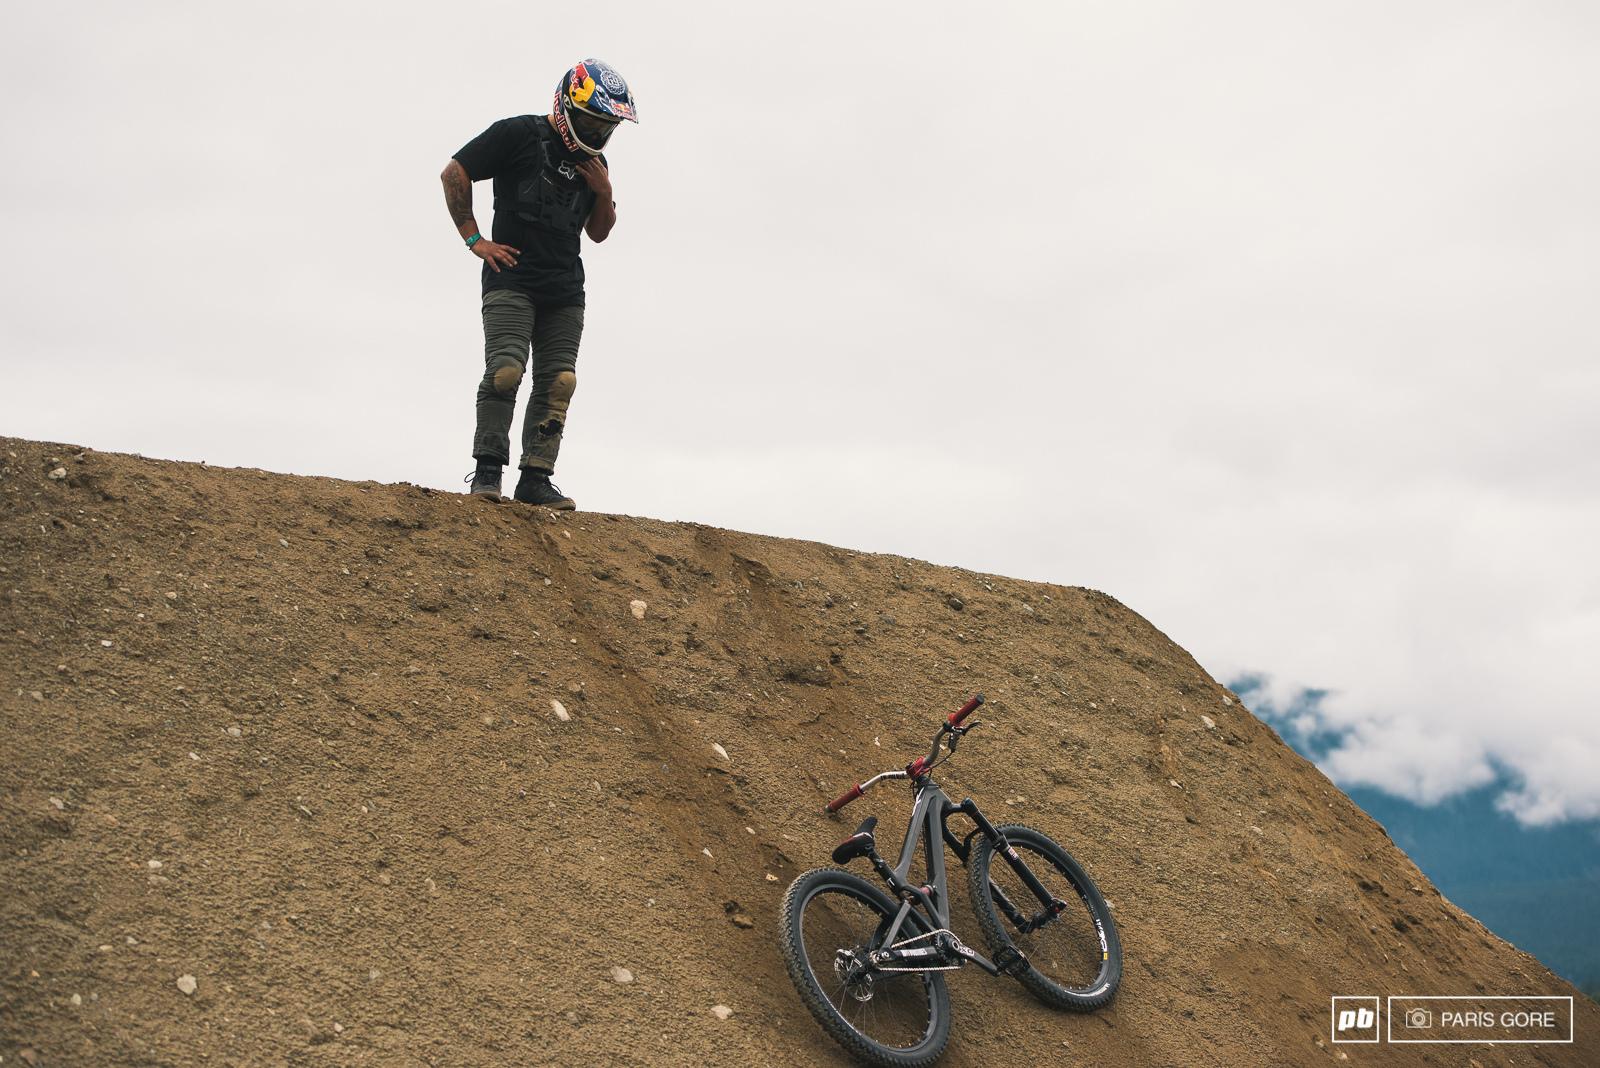 Yannick Graneri got his bike stuck in a very interesting place.